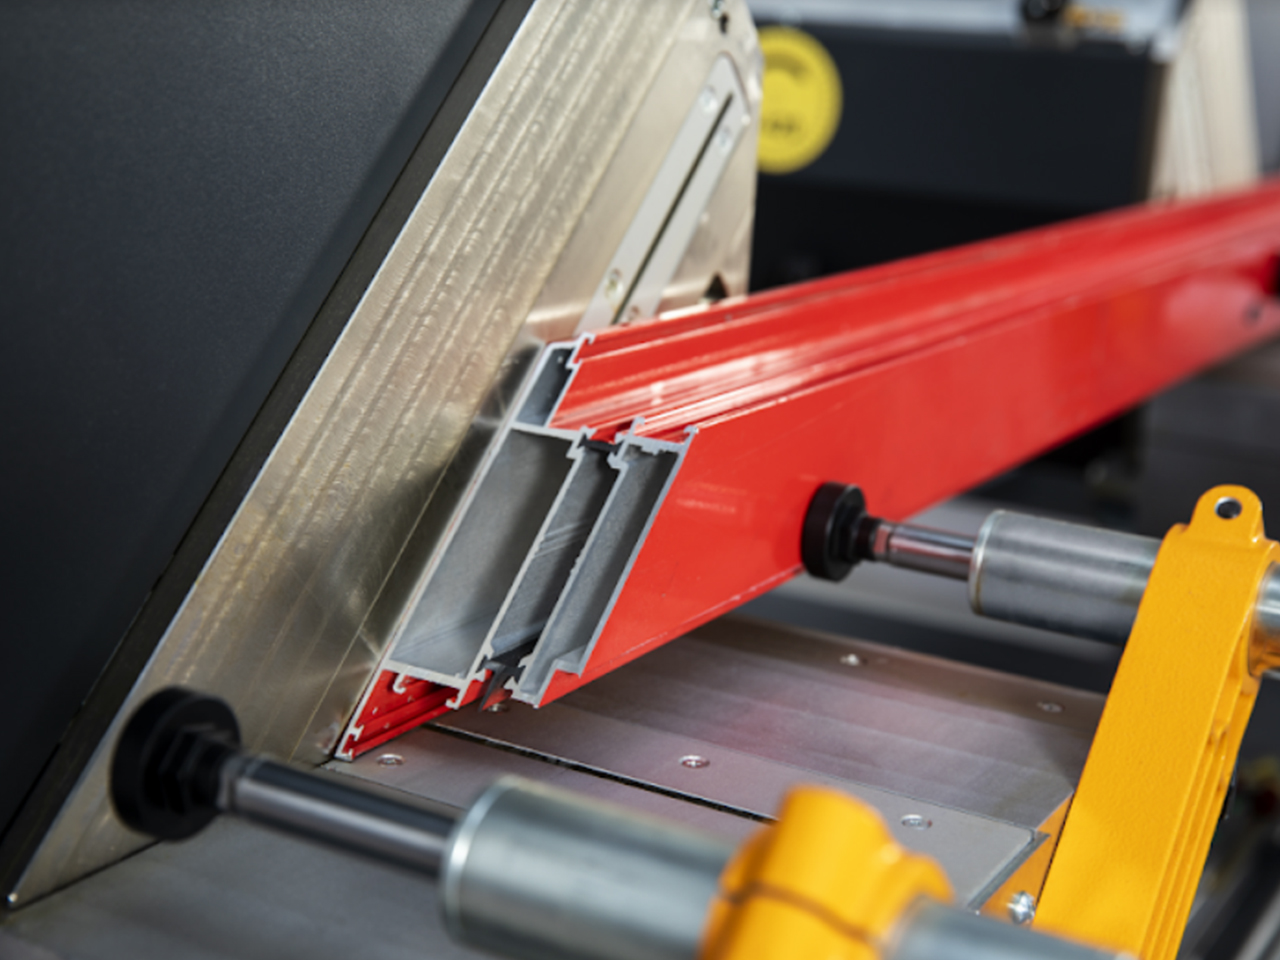 ZIGMA-02 AP CNC Double Head Miter Saw Cutting Machine 16-12 (420 mm) Aluminium Profile